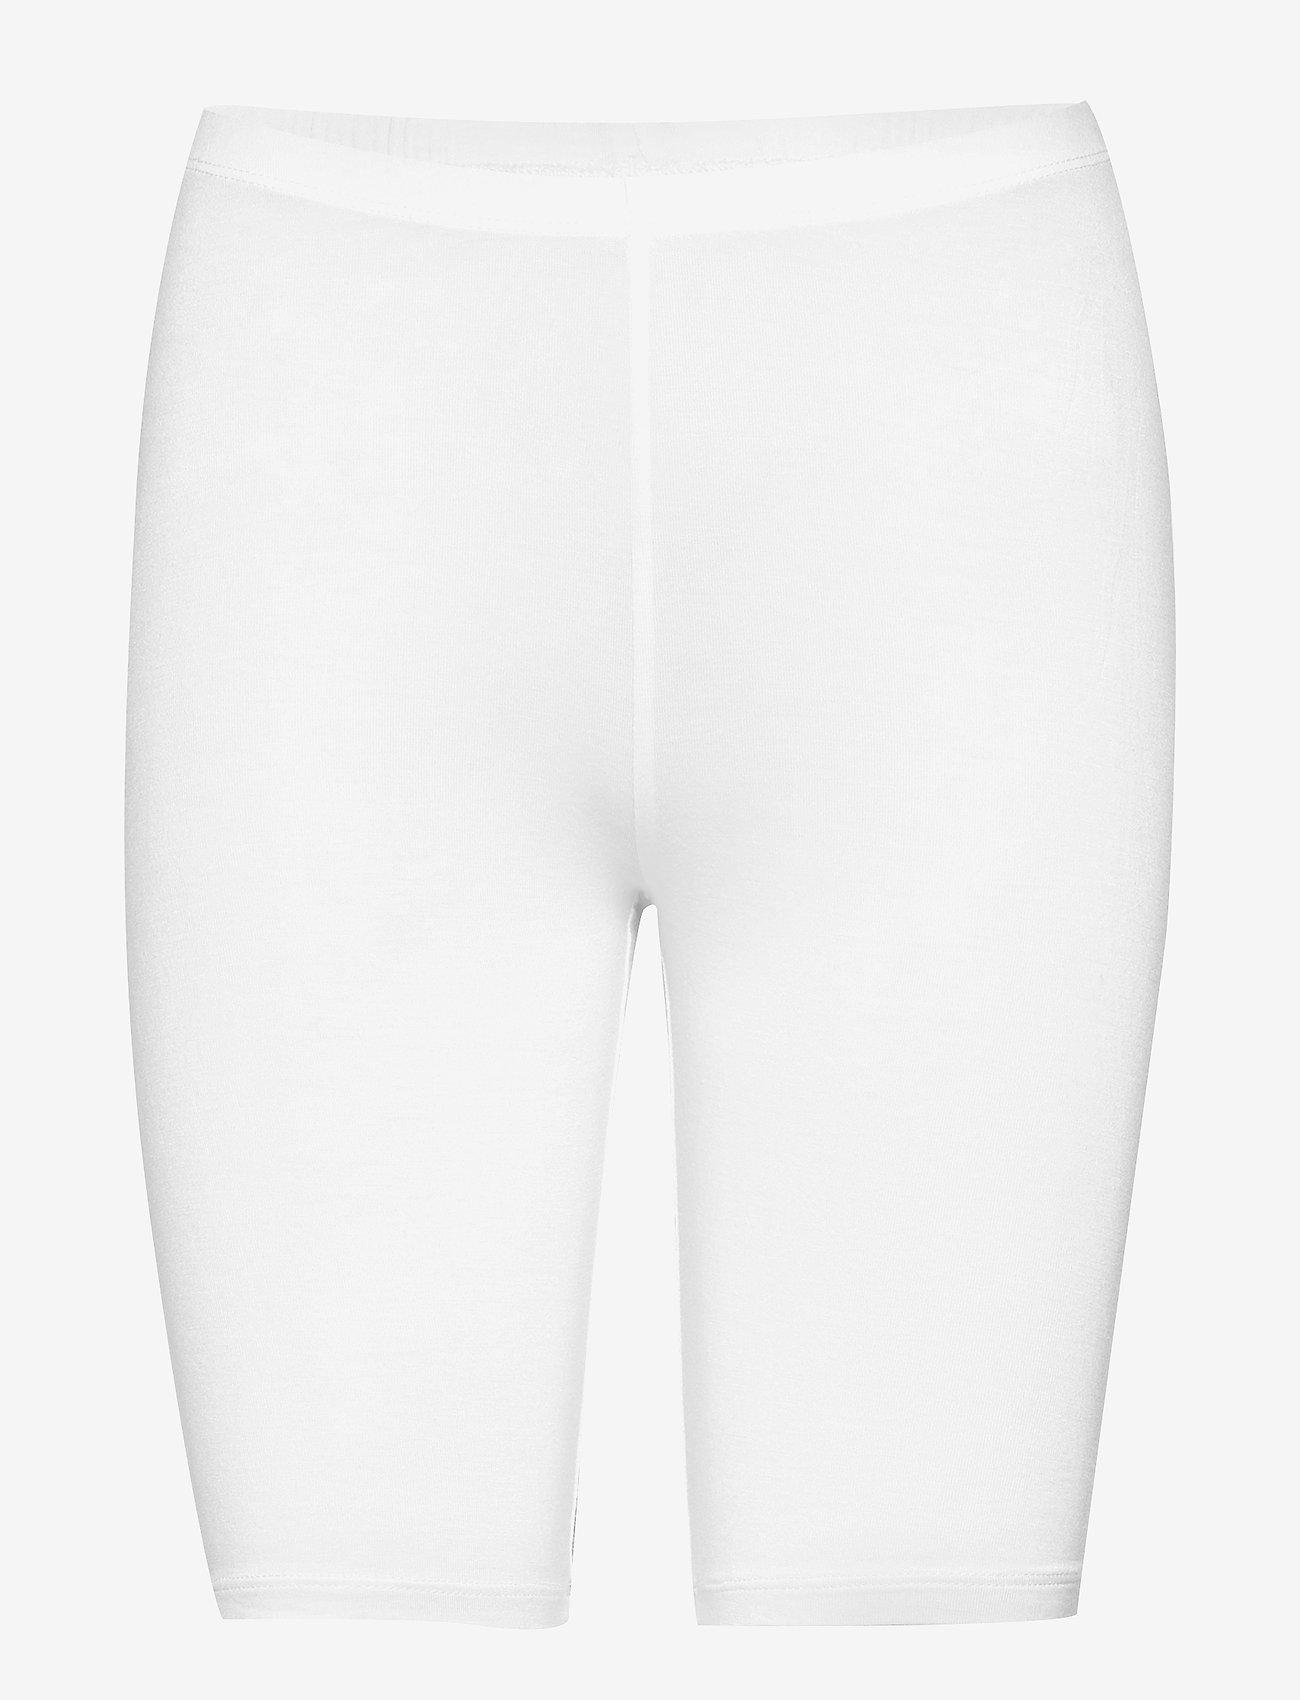 Decoy - DECOY shorts viscose stretch - bottoms - white - 0